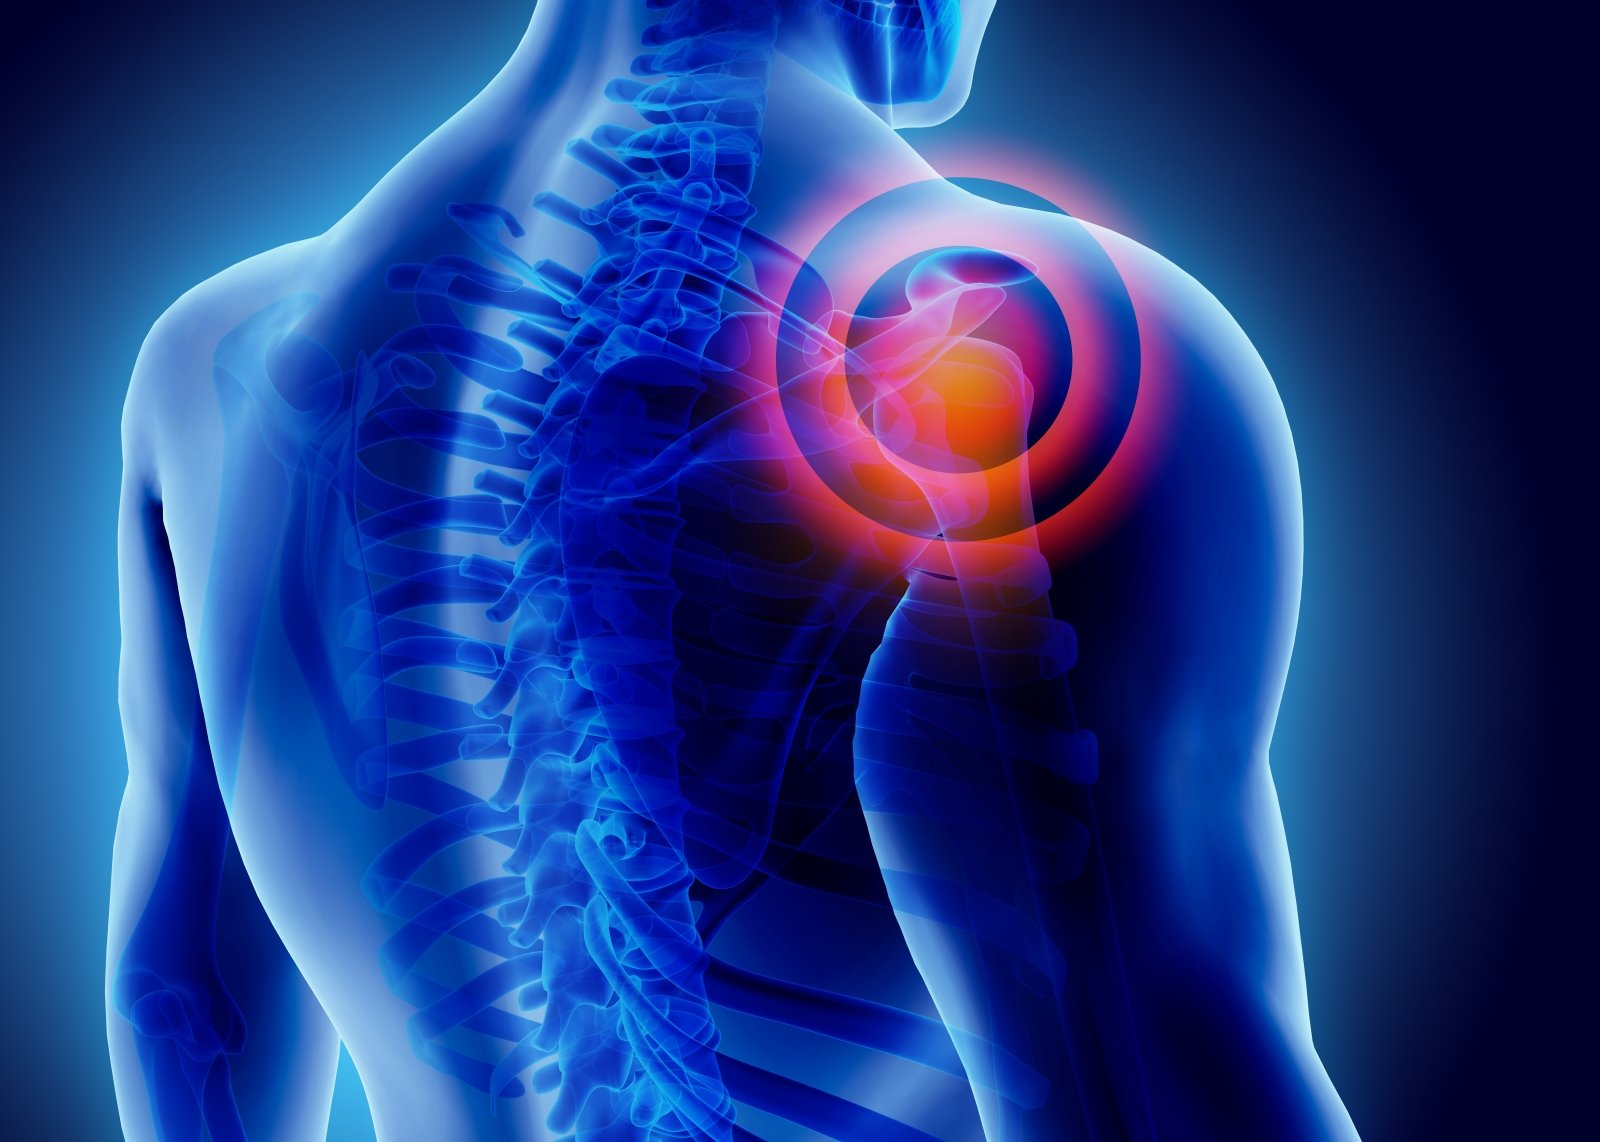 skauda nugaros apacia kaireje